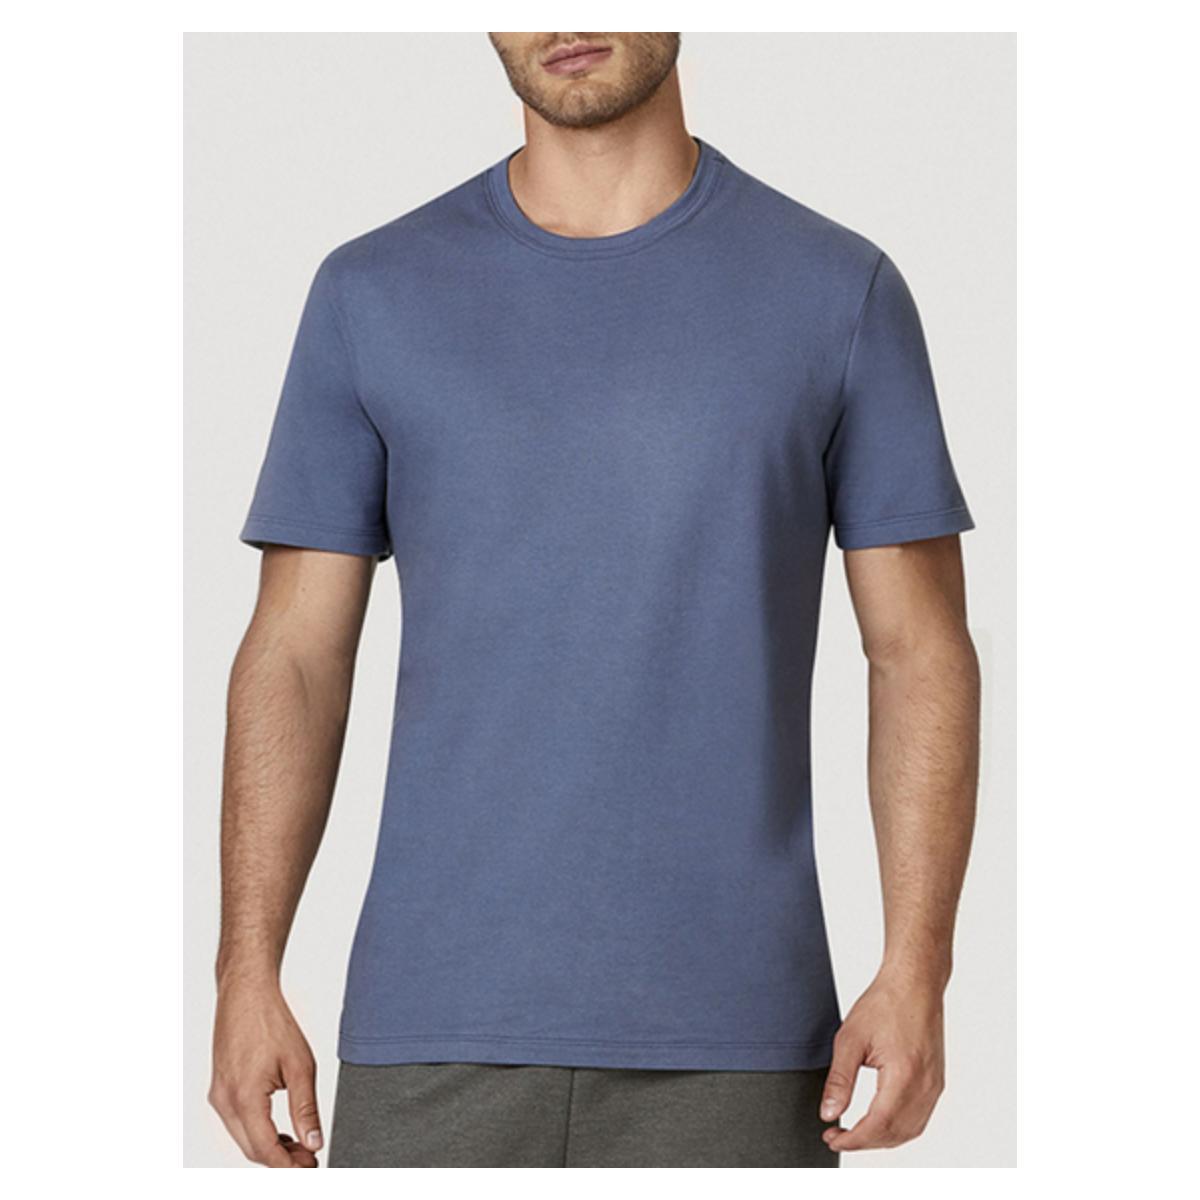 Camiseta Masculina Hering 0227 Av2en Azul